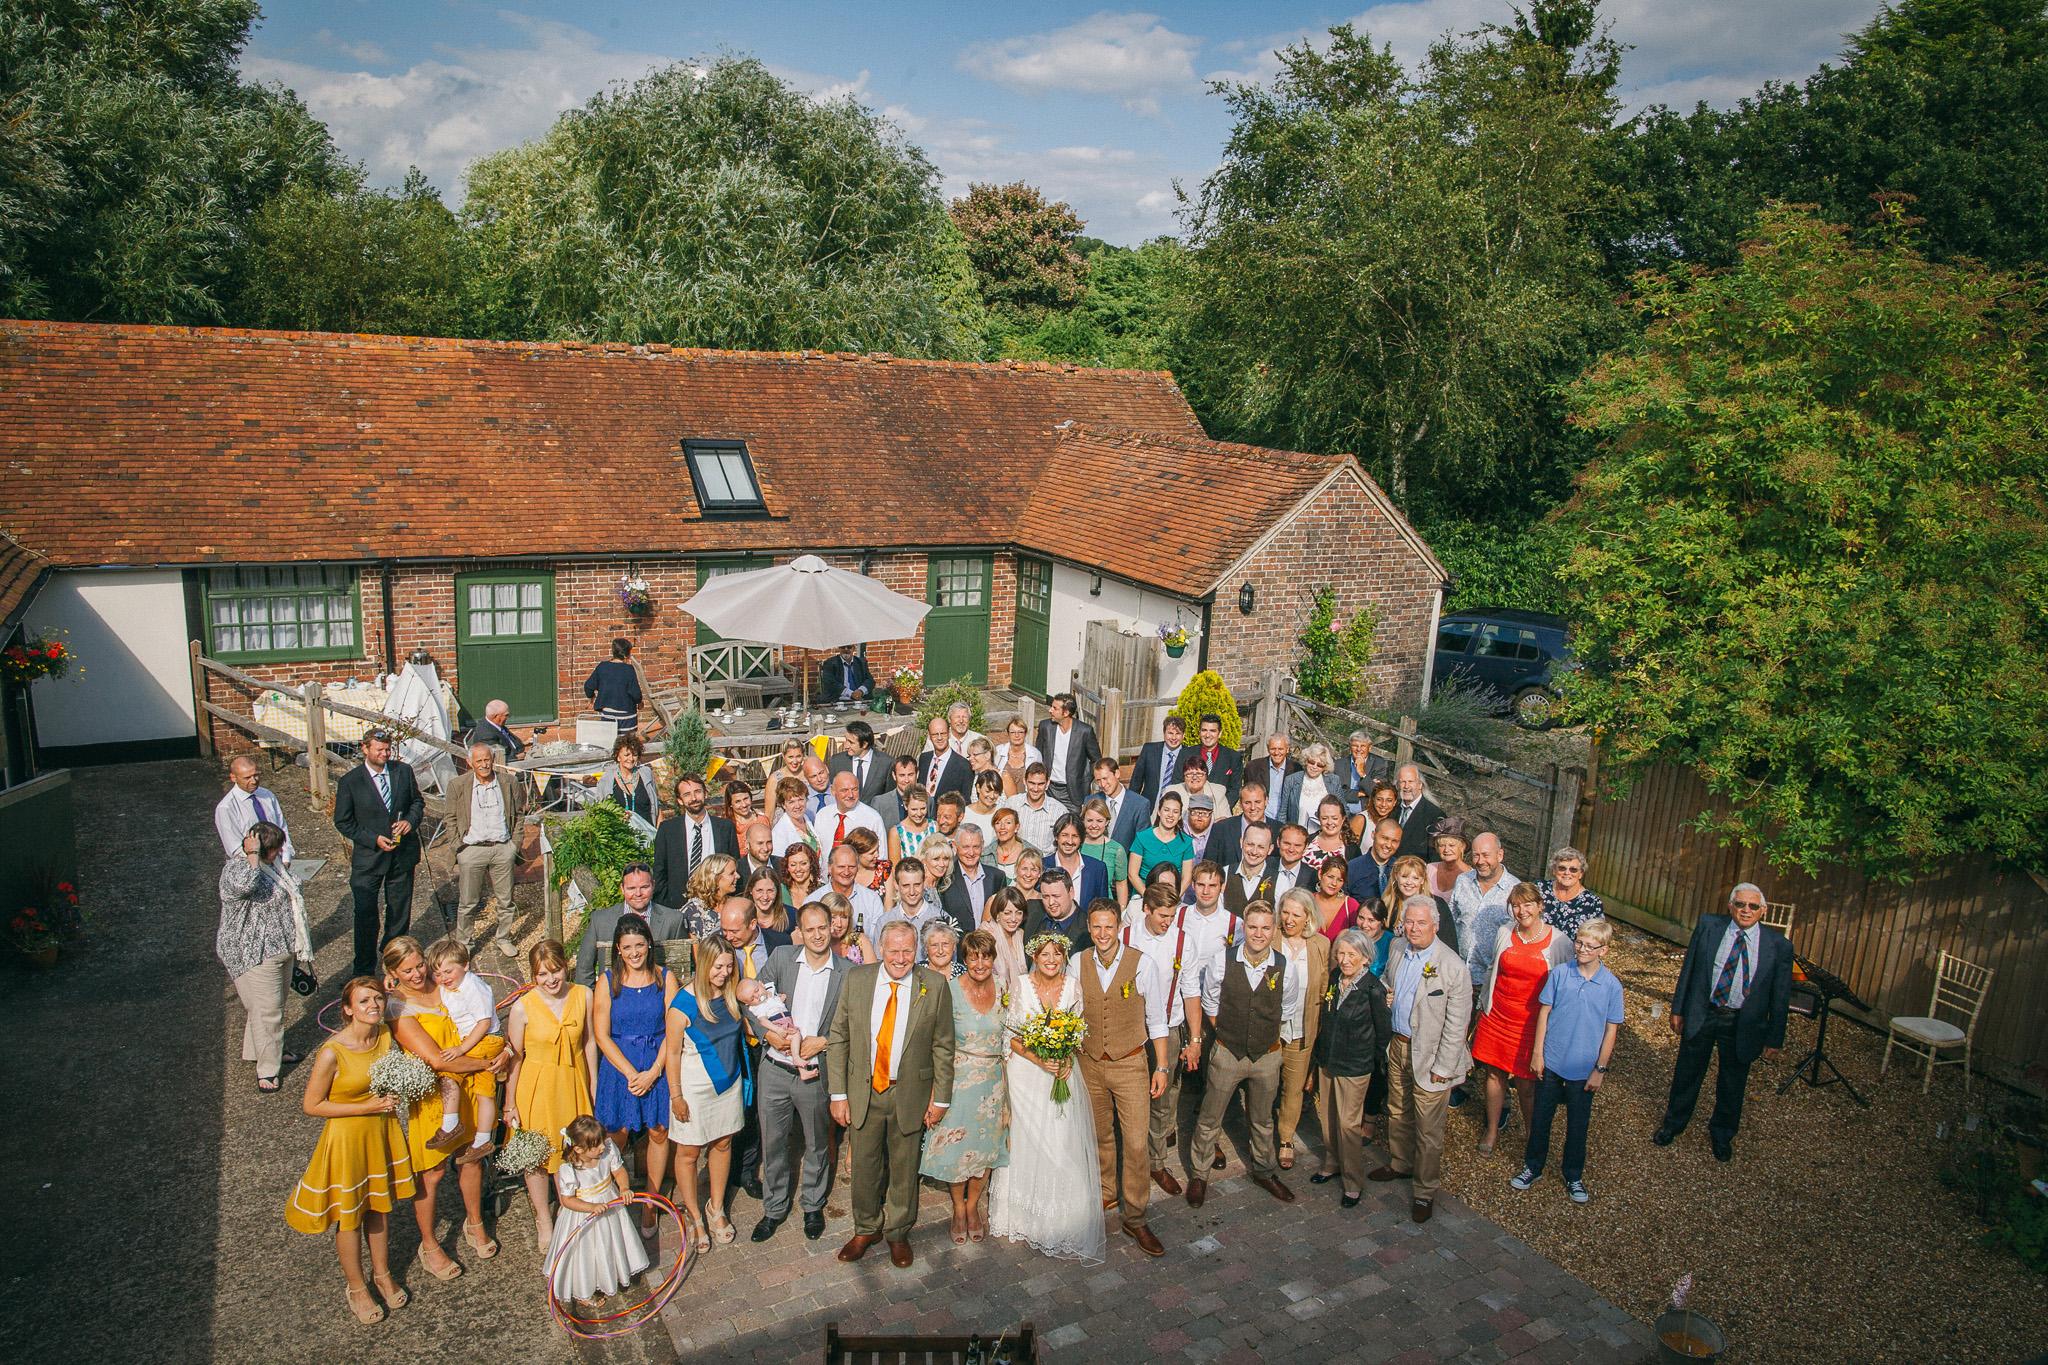 chantry_sussex_barn_wedding_340.jpg